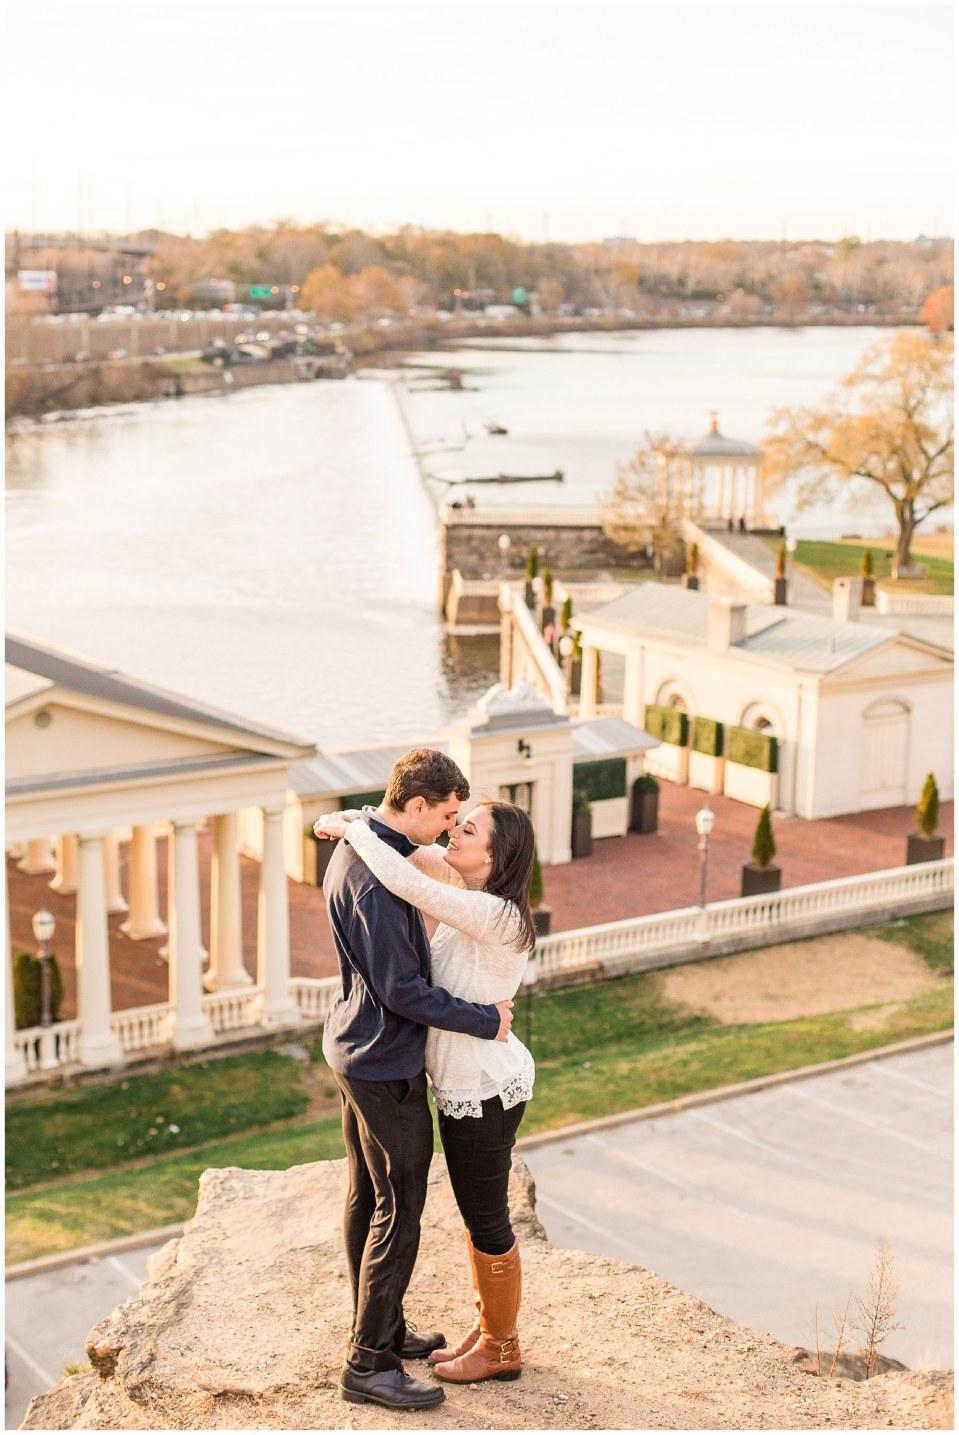 Darren & Elizabeth's November Engagement at Waterworks and Cescaphe Venue in Philadelphia Photos_0022.jpg